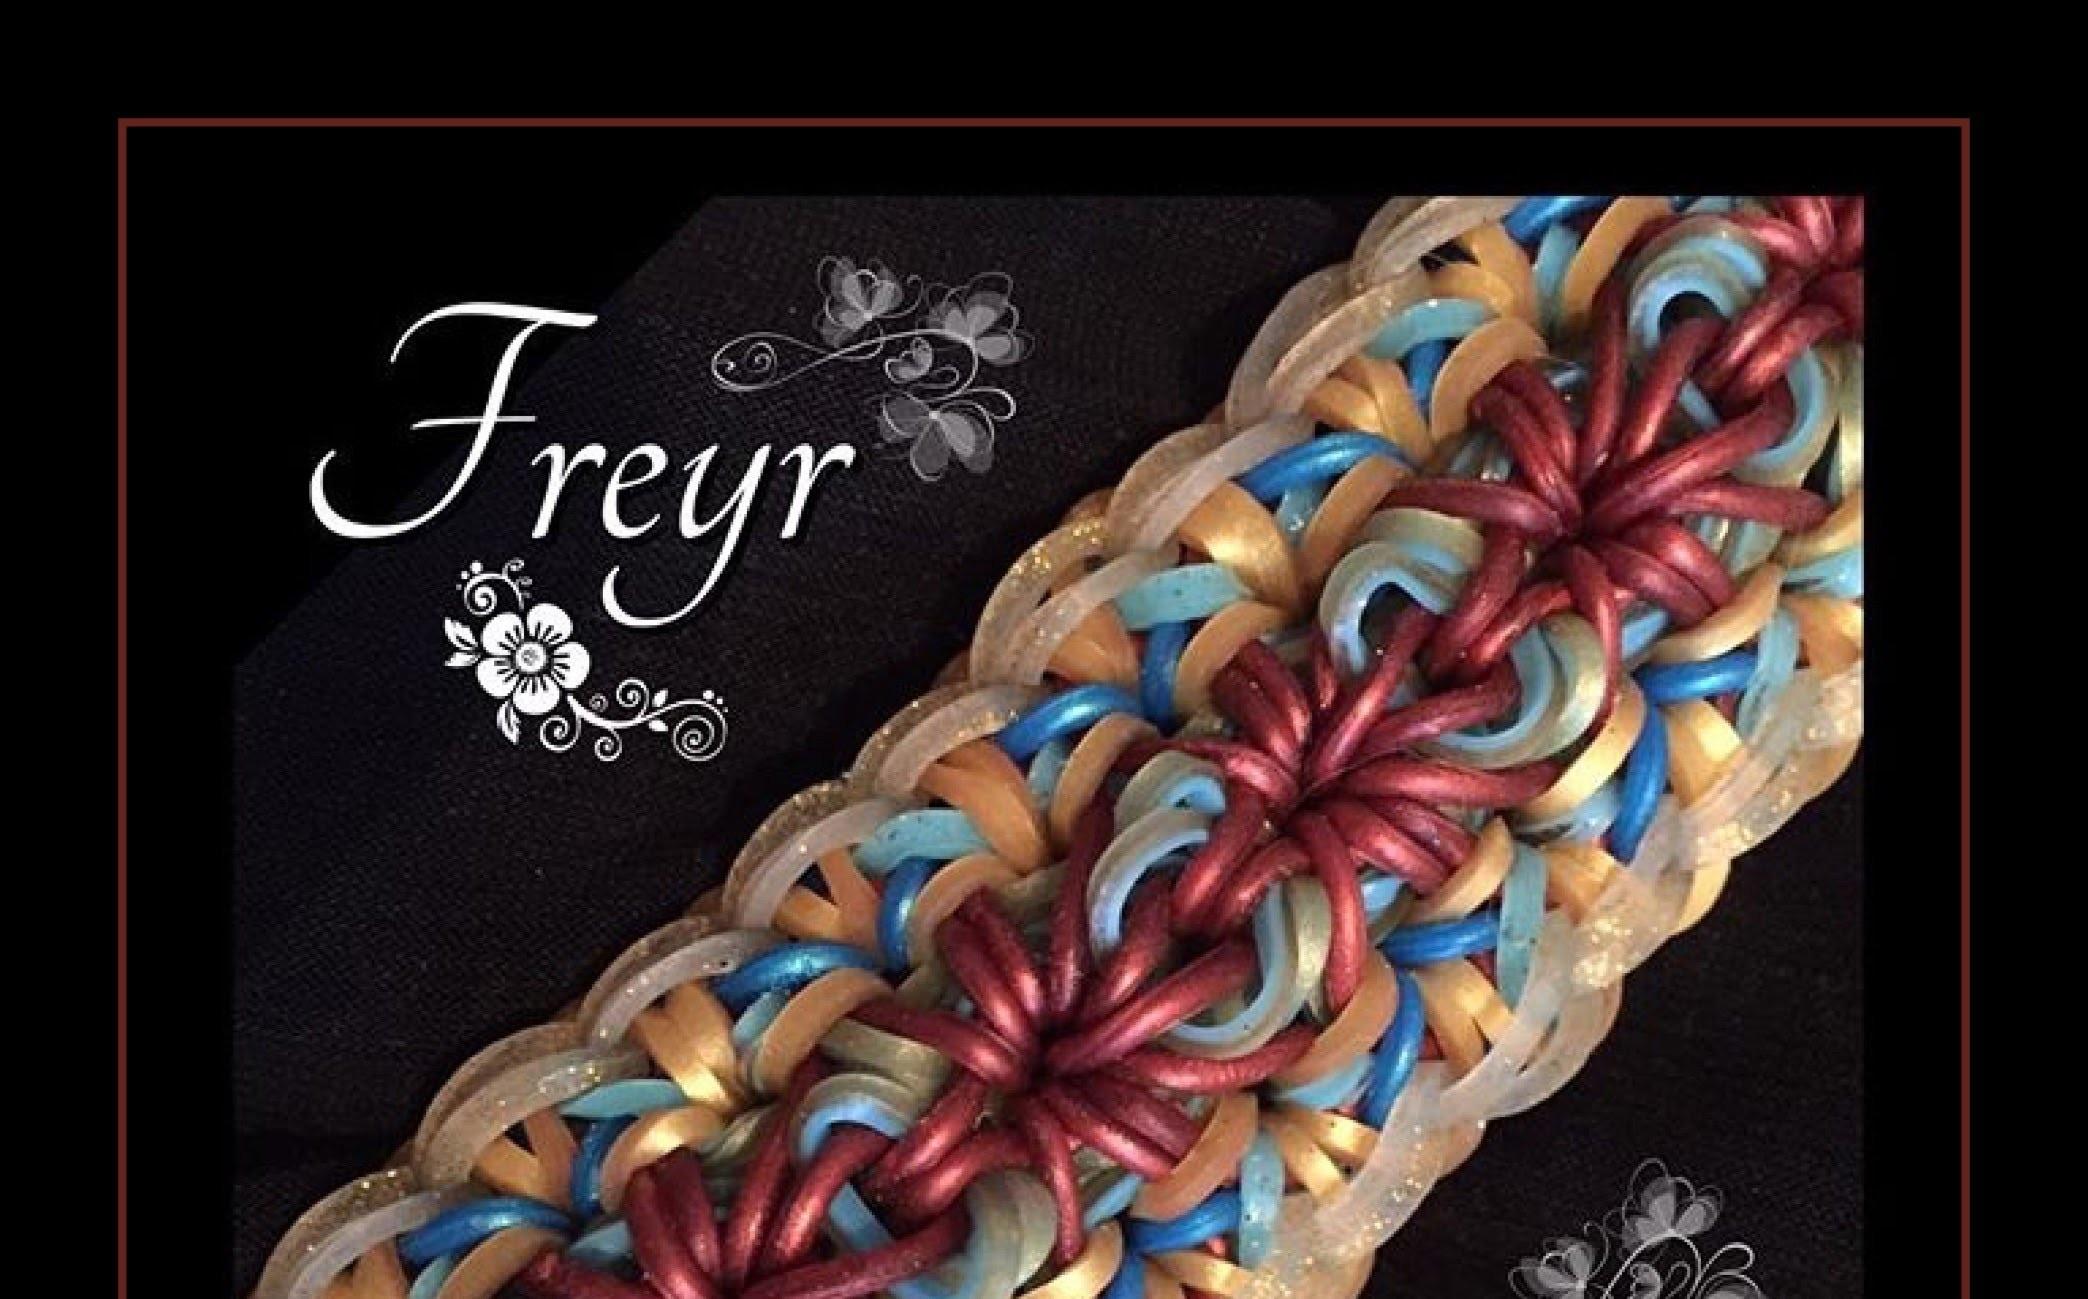 Rainbow Loom Band Freyr Bracelet Tutorial.How To